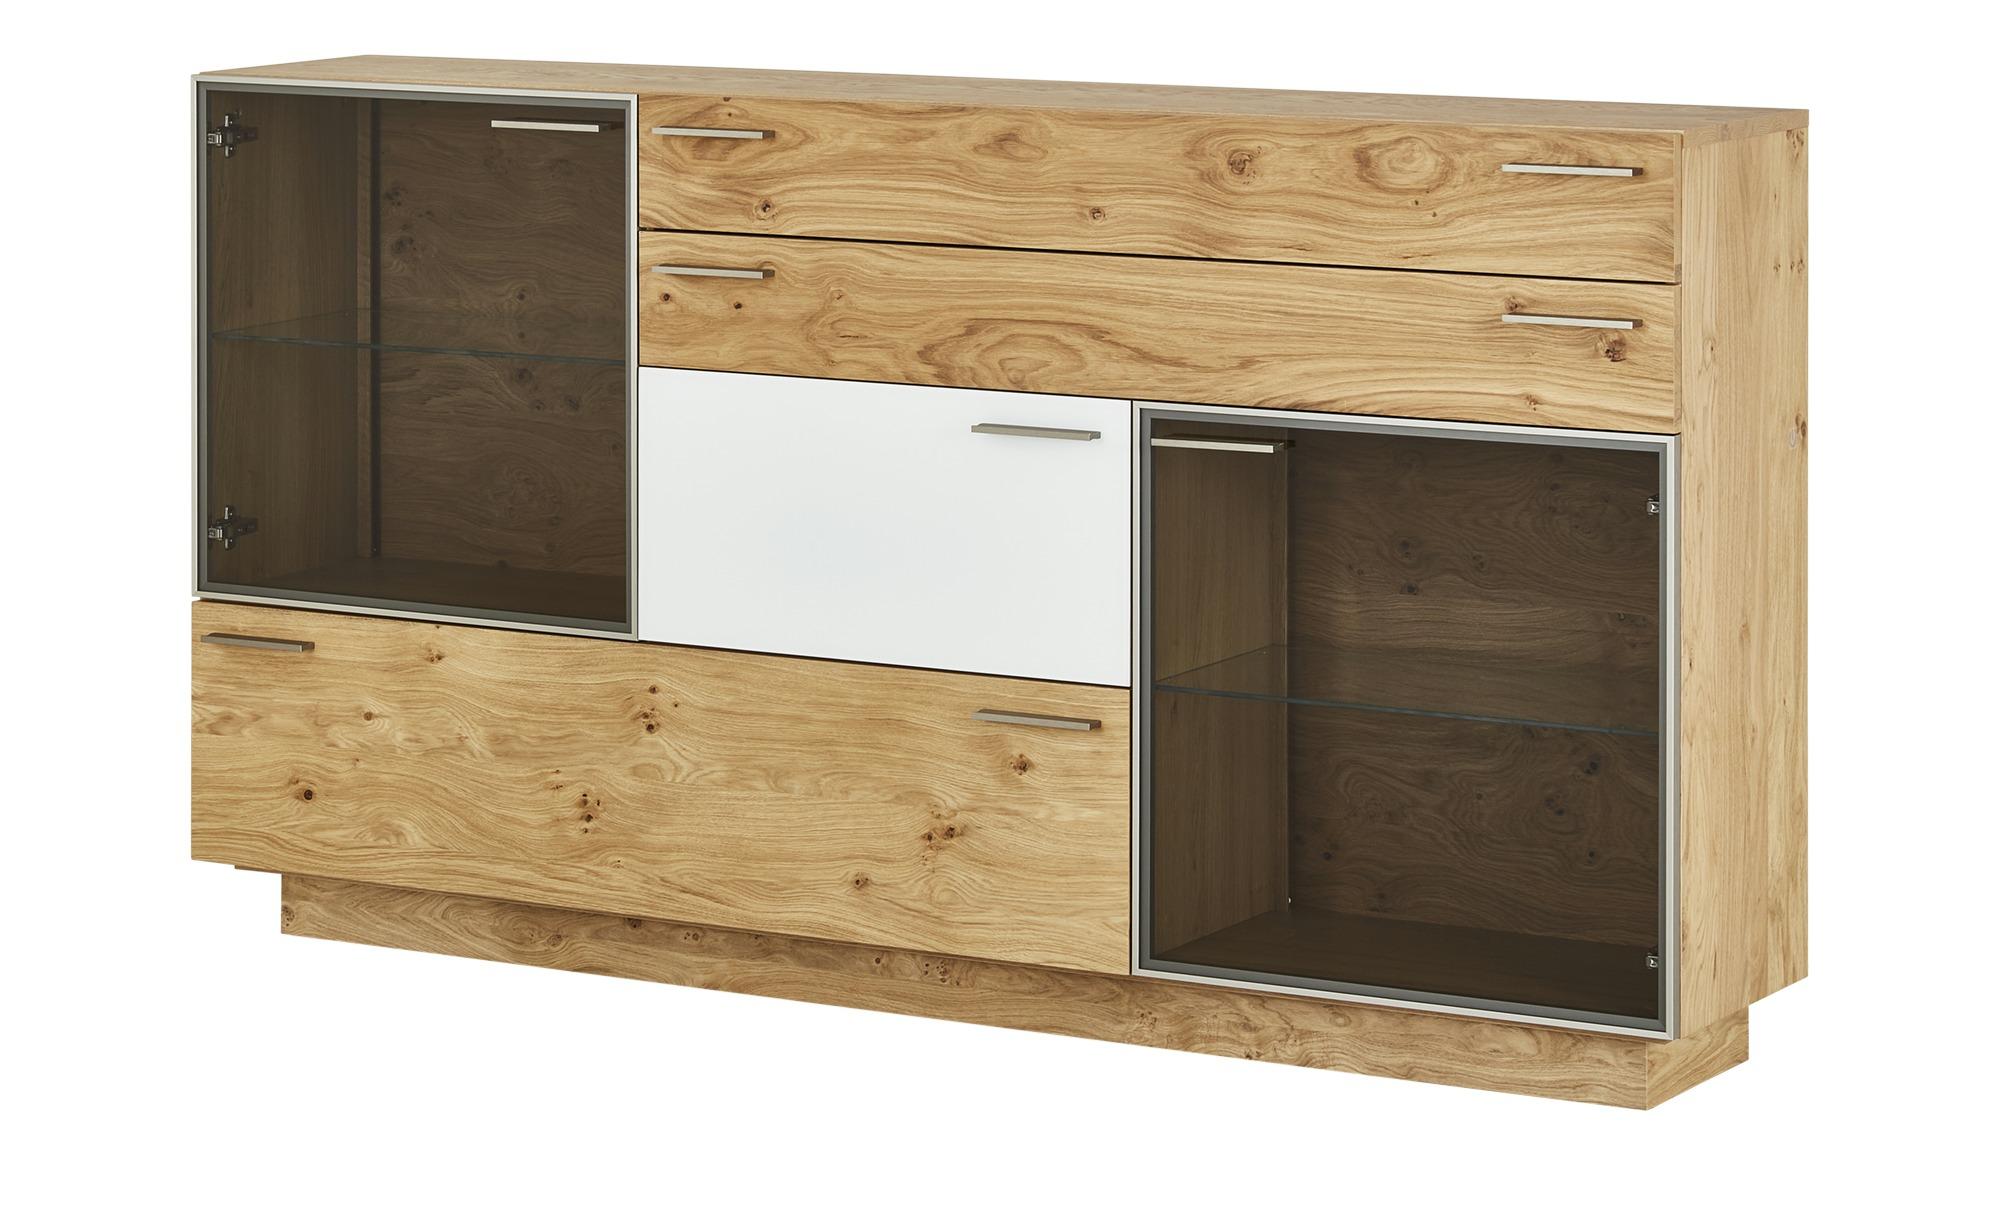 Sideboard  Seefeld ¦ holzfarben ¦ Maße (cm): B: 192 H: 107 T: 38 Kommoden & Sideboards > Sideboards - Höffner